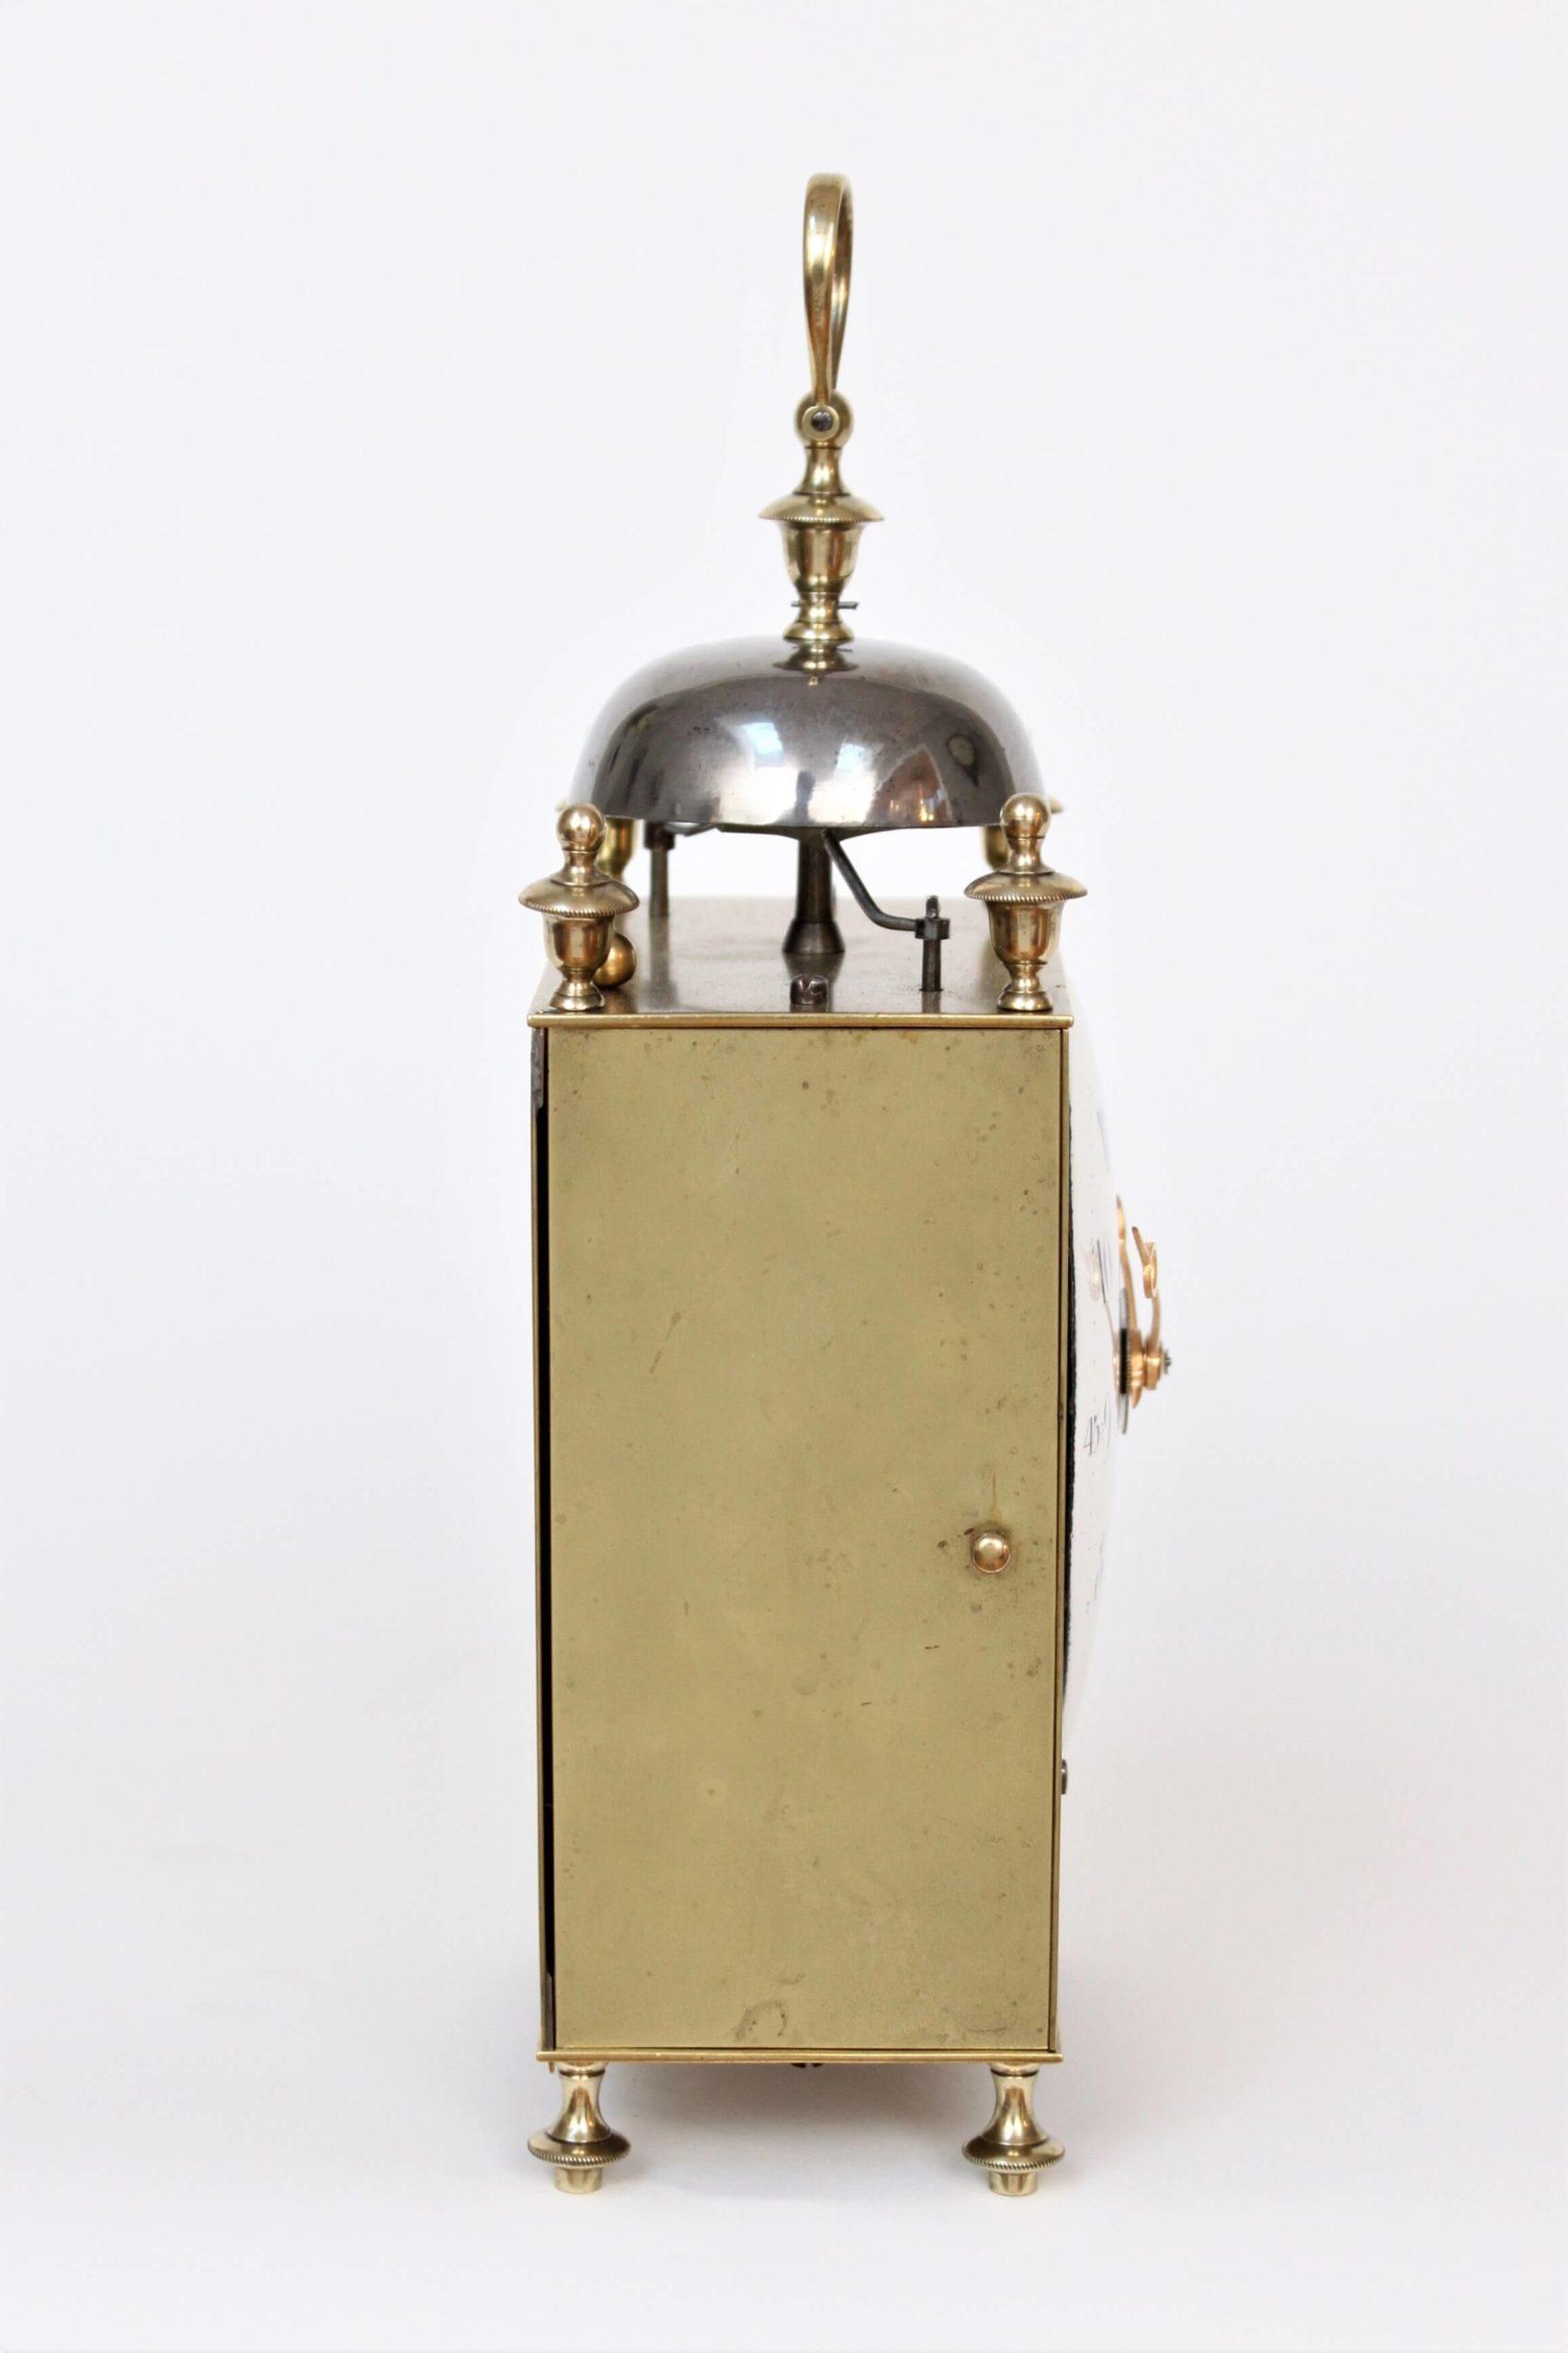 Swiss-brass-striking-repeating-antique-travel-capucine-chaux De Fonds-clock-timepiece-